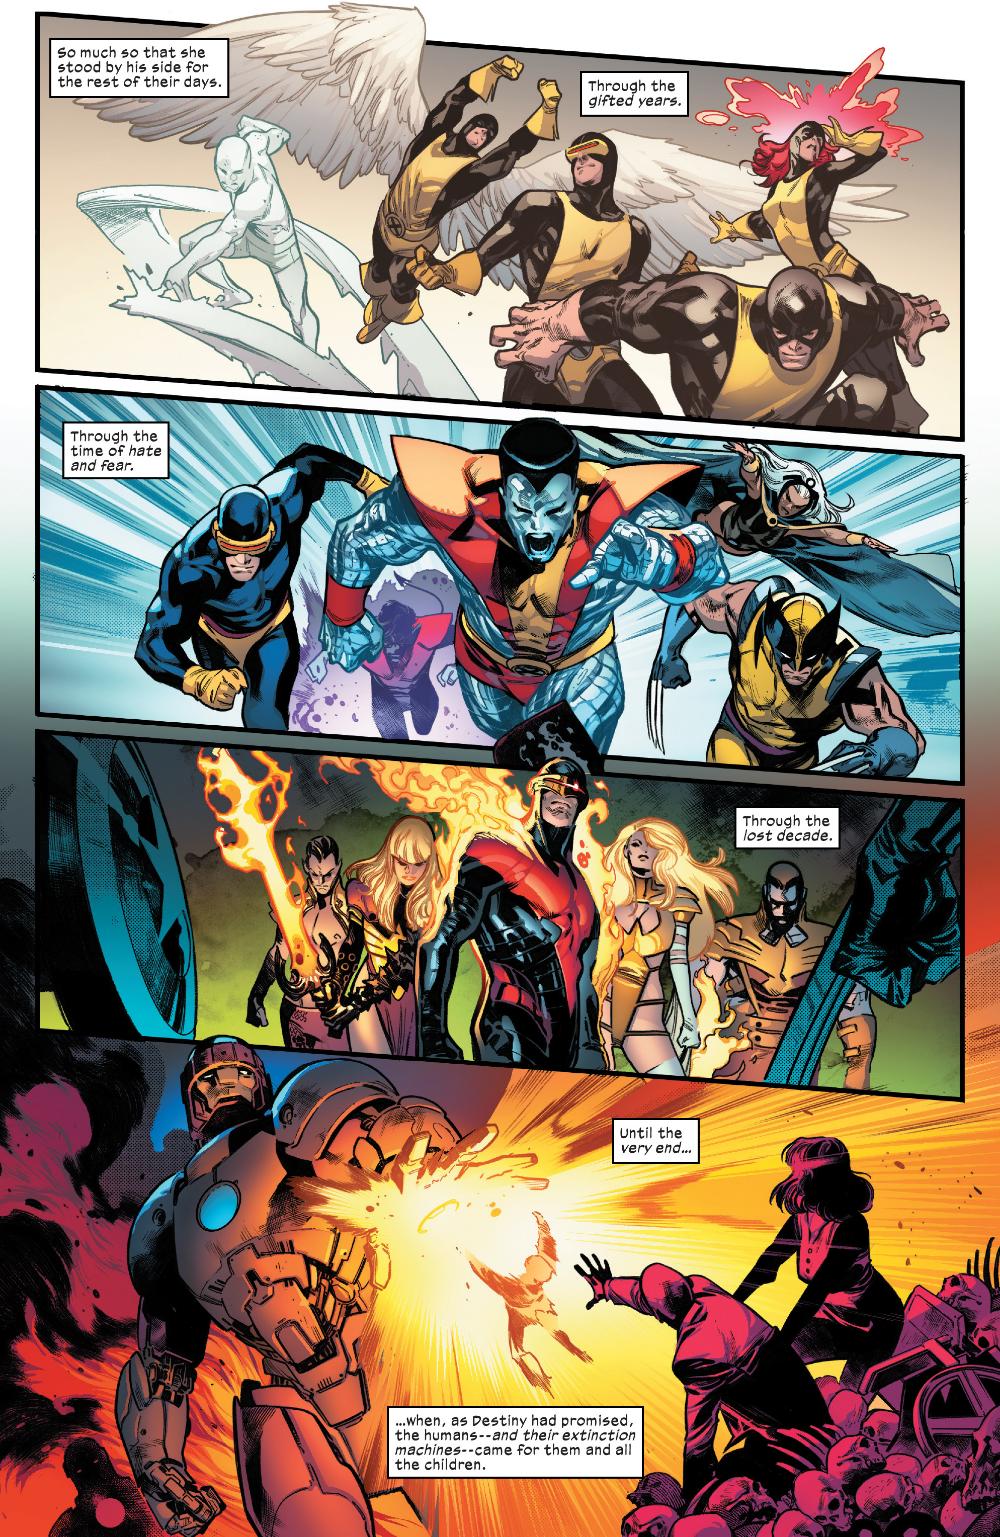 House Of X 2019 Chapter 2 Page 1 In 2020 Marvel Comics Art Xmen Comics Infinity Gauntlet Comic